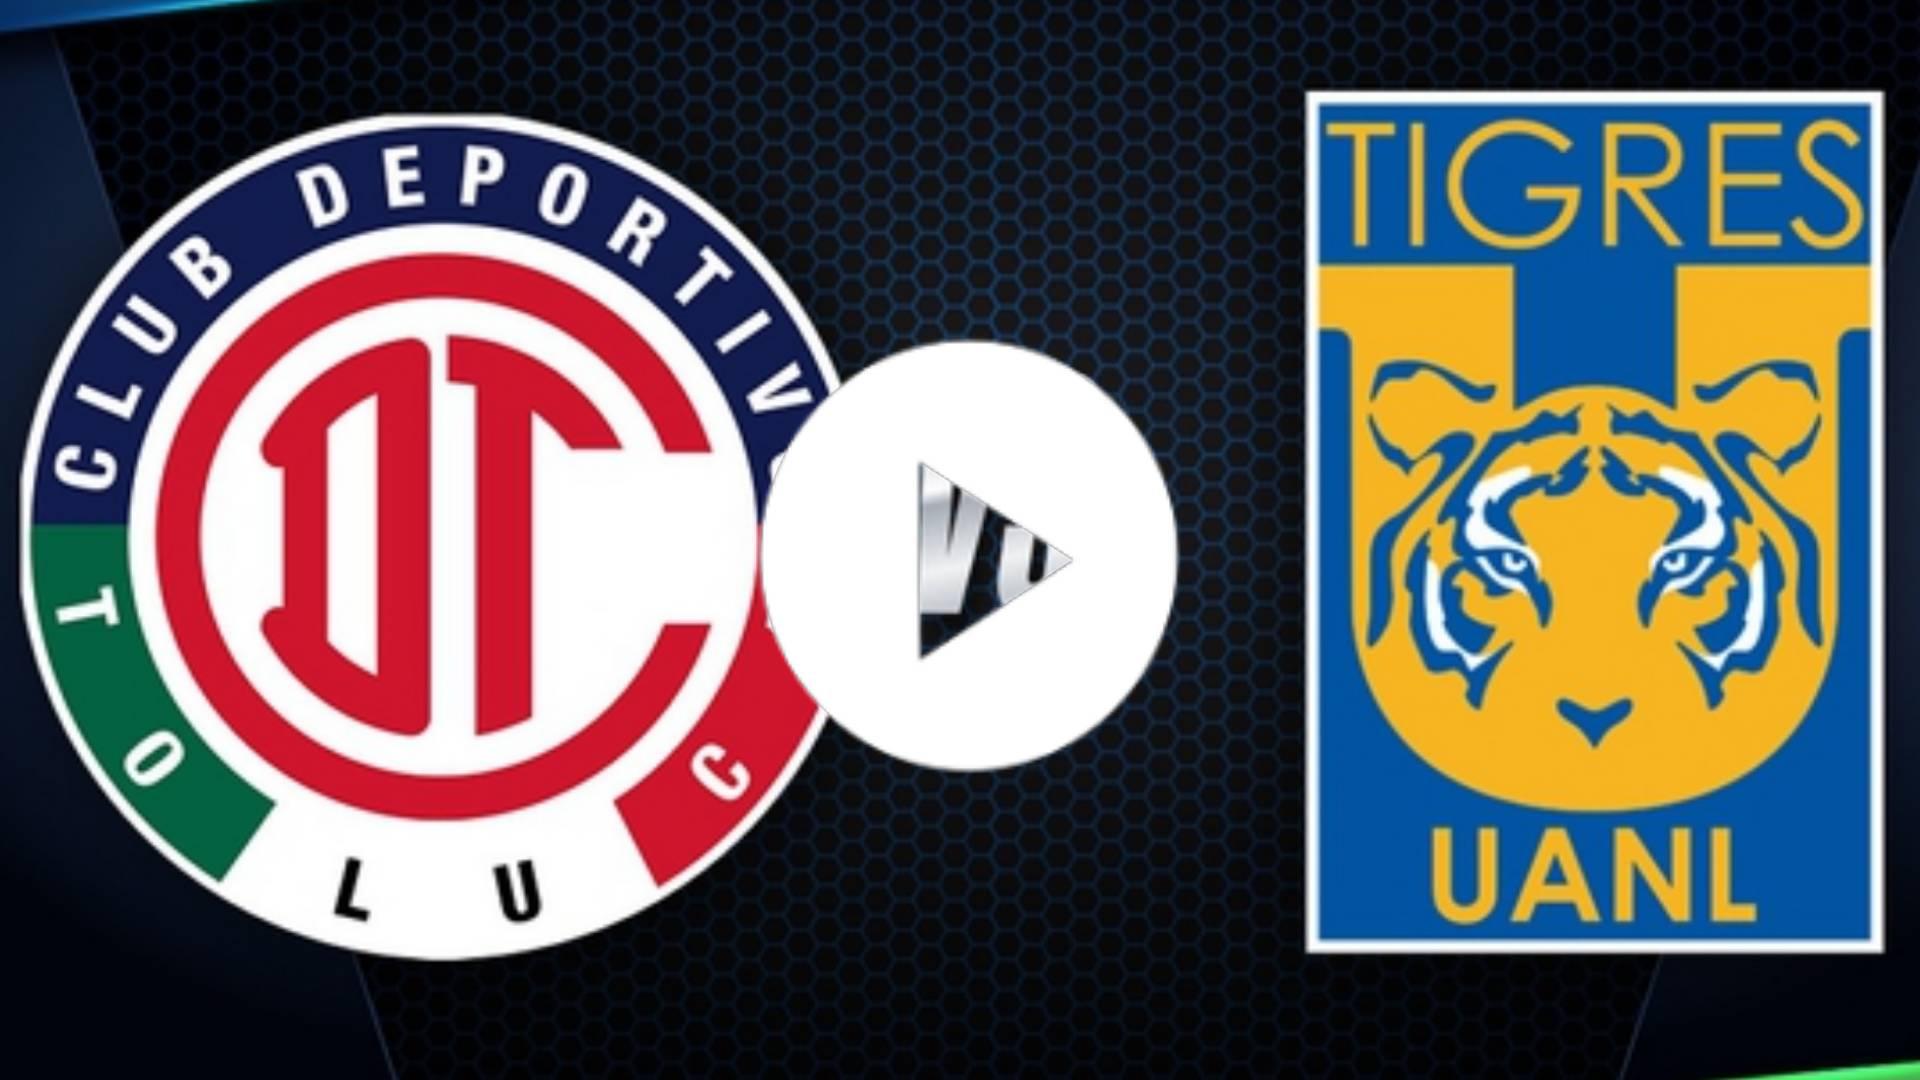 LIGA MX EN VIVO: Tigres UANL vs Toluca EN VIVO ONLINE, Hora Y Donde Ver   Liga MX 2020 EN VIVO